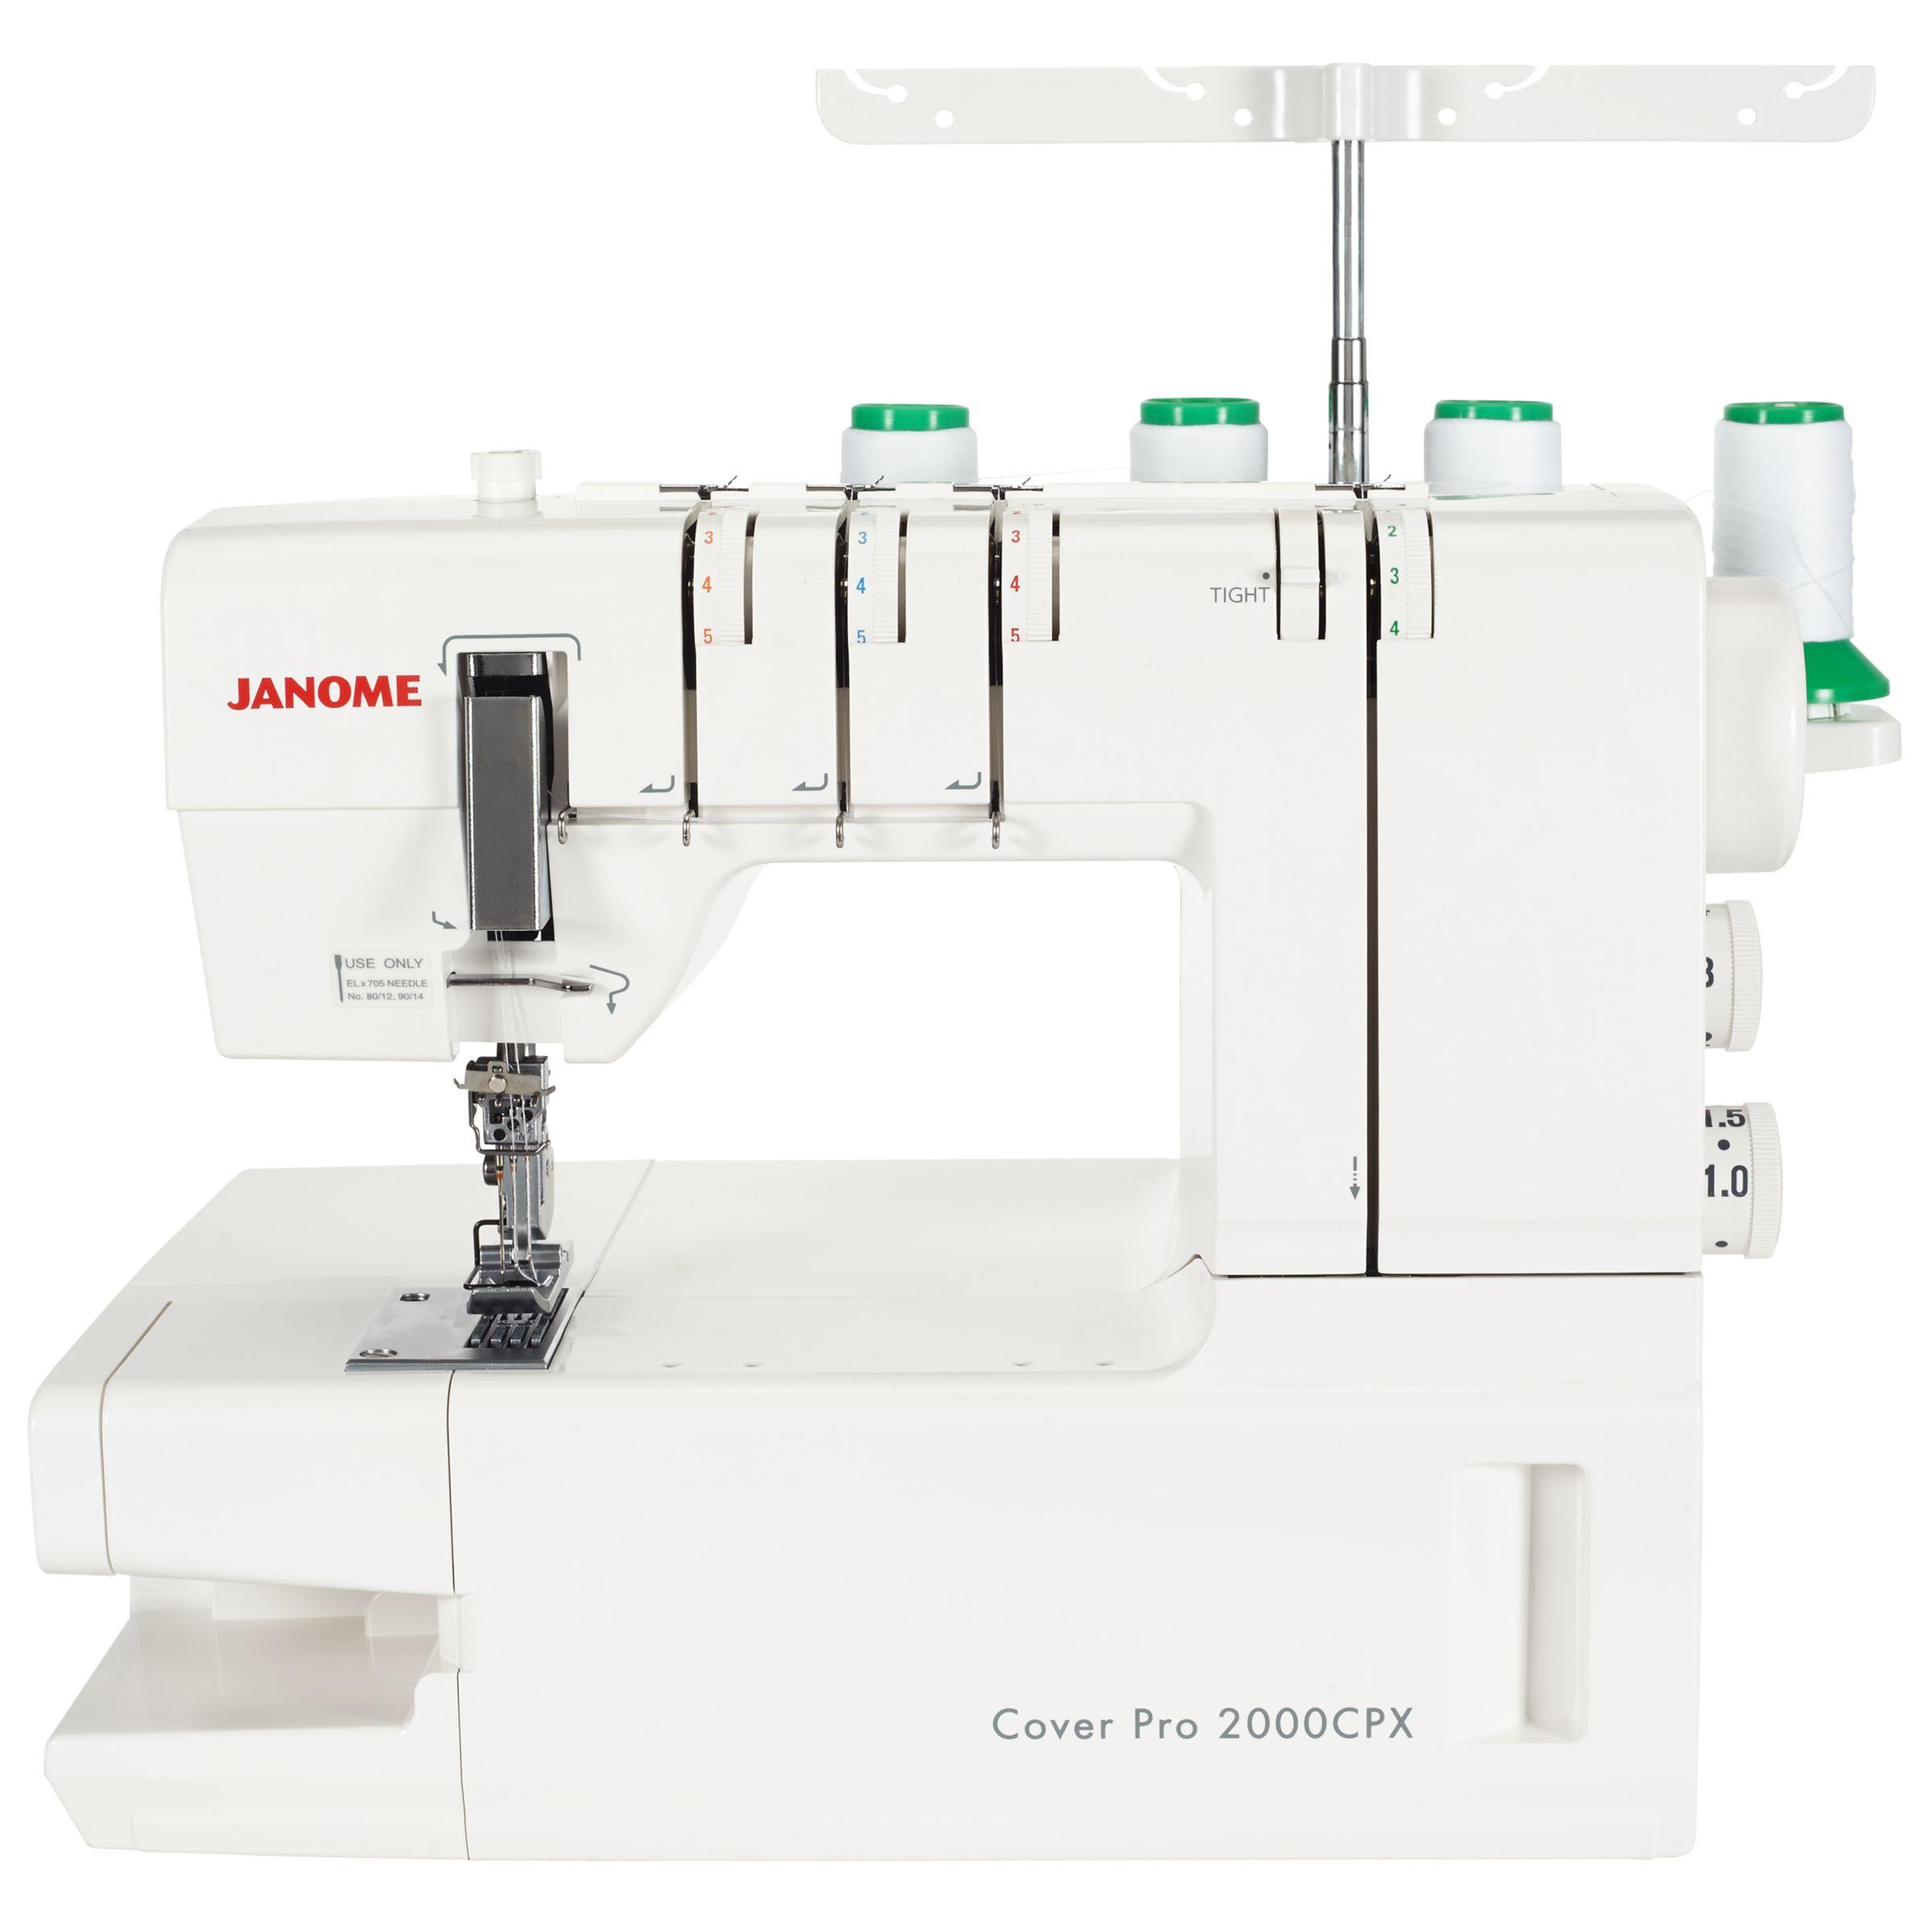 Janome Janome Coverpro 2000CPX Coverstitch Hemmer Machine